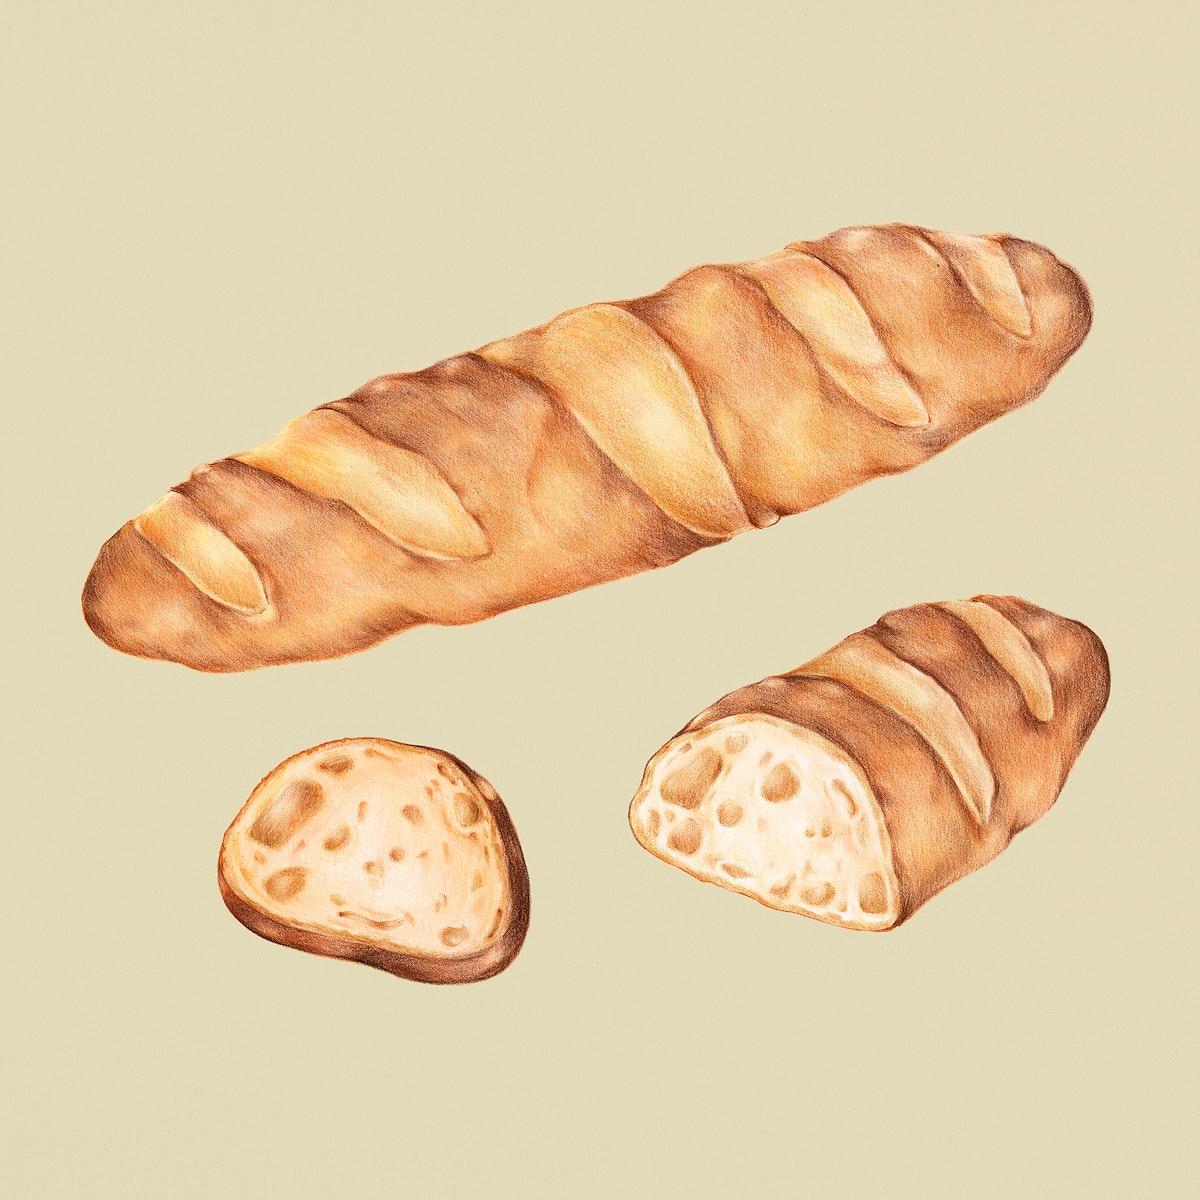 Freshly baked baguette hand-drawn illustration